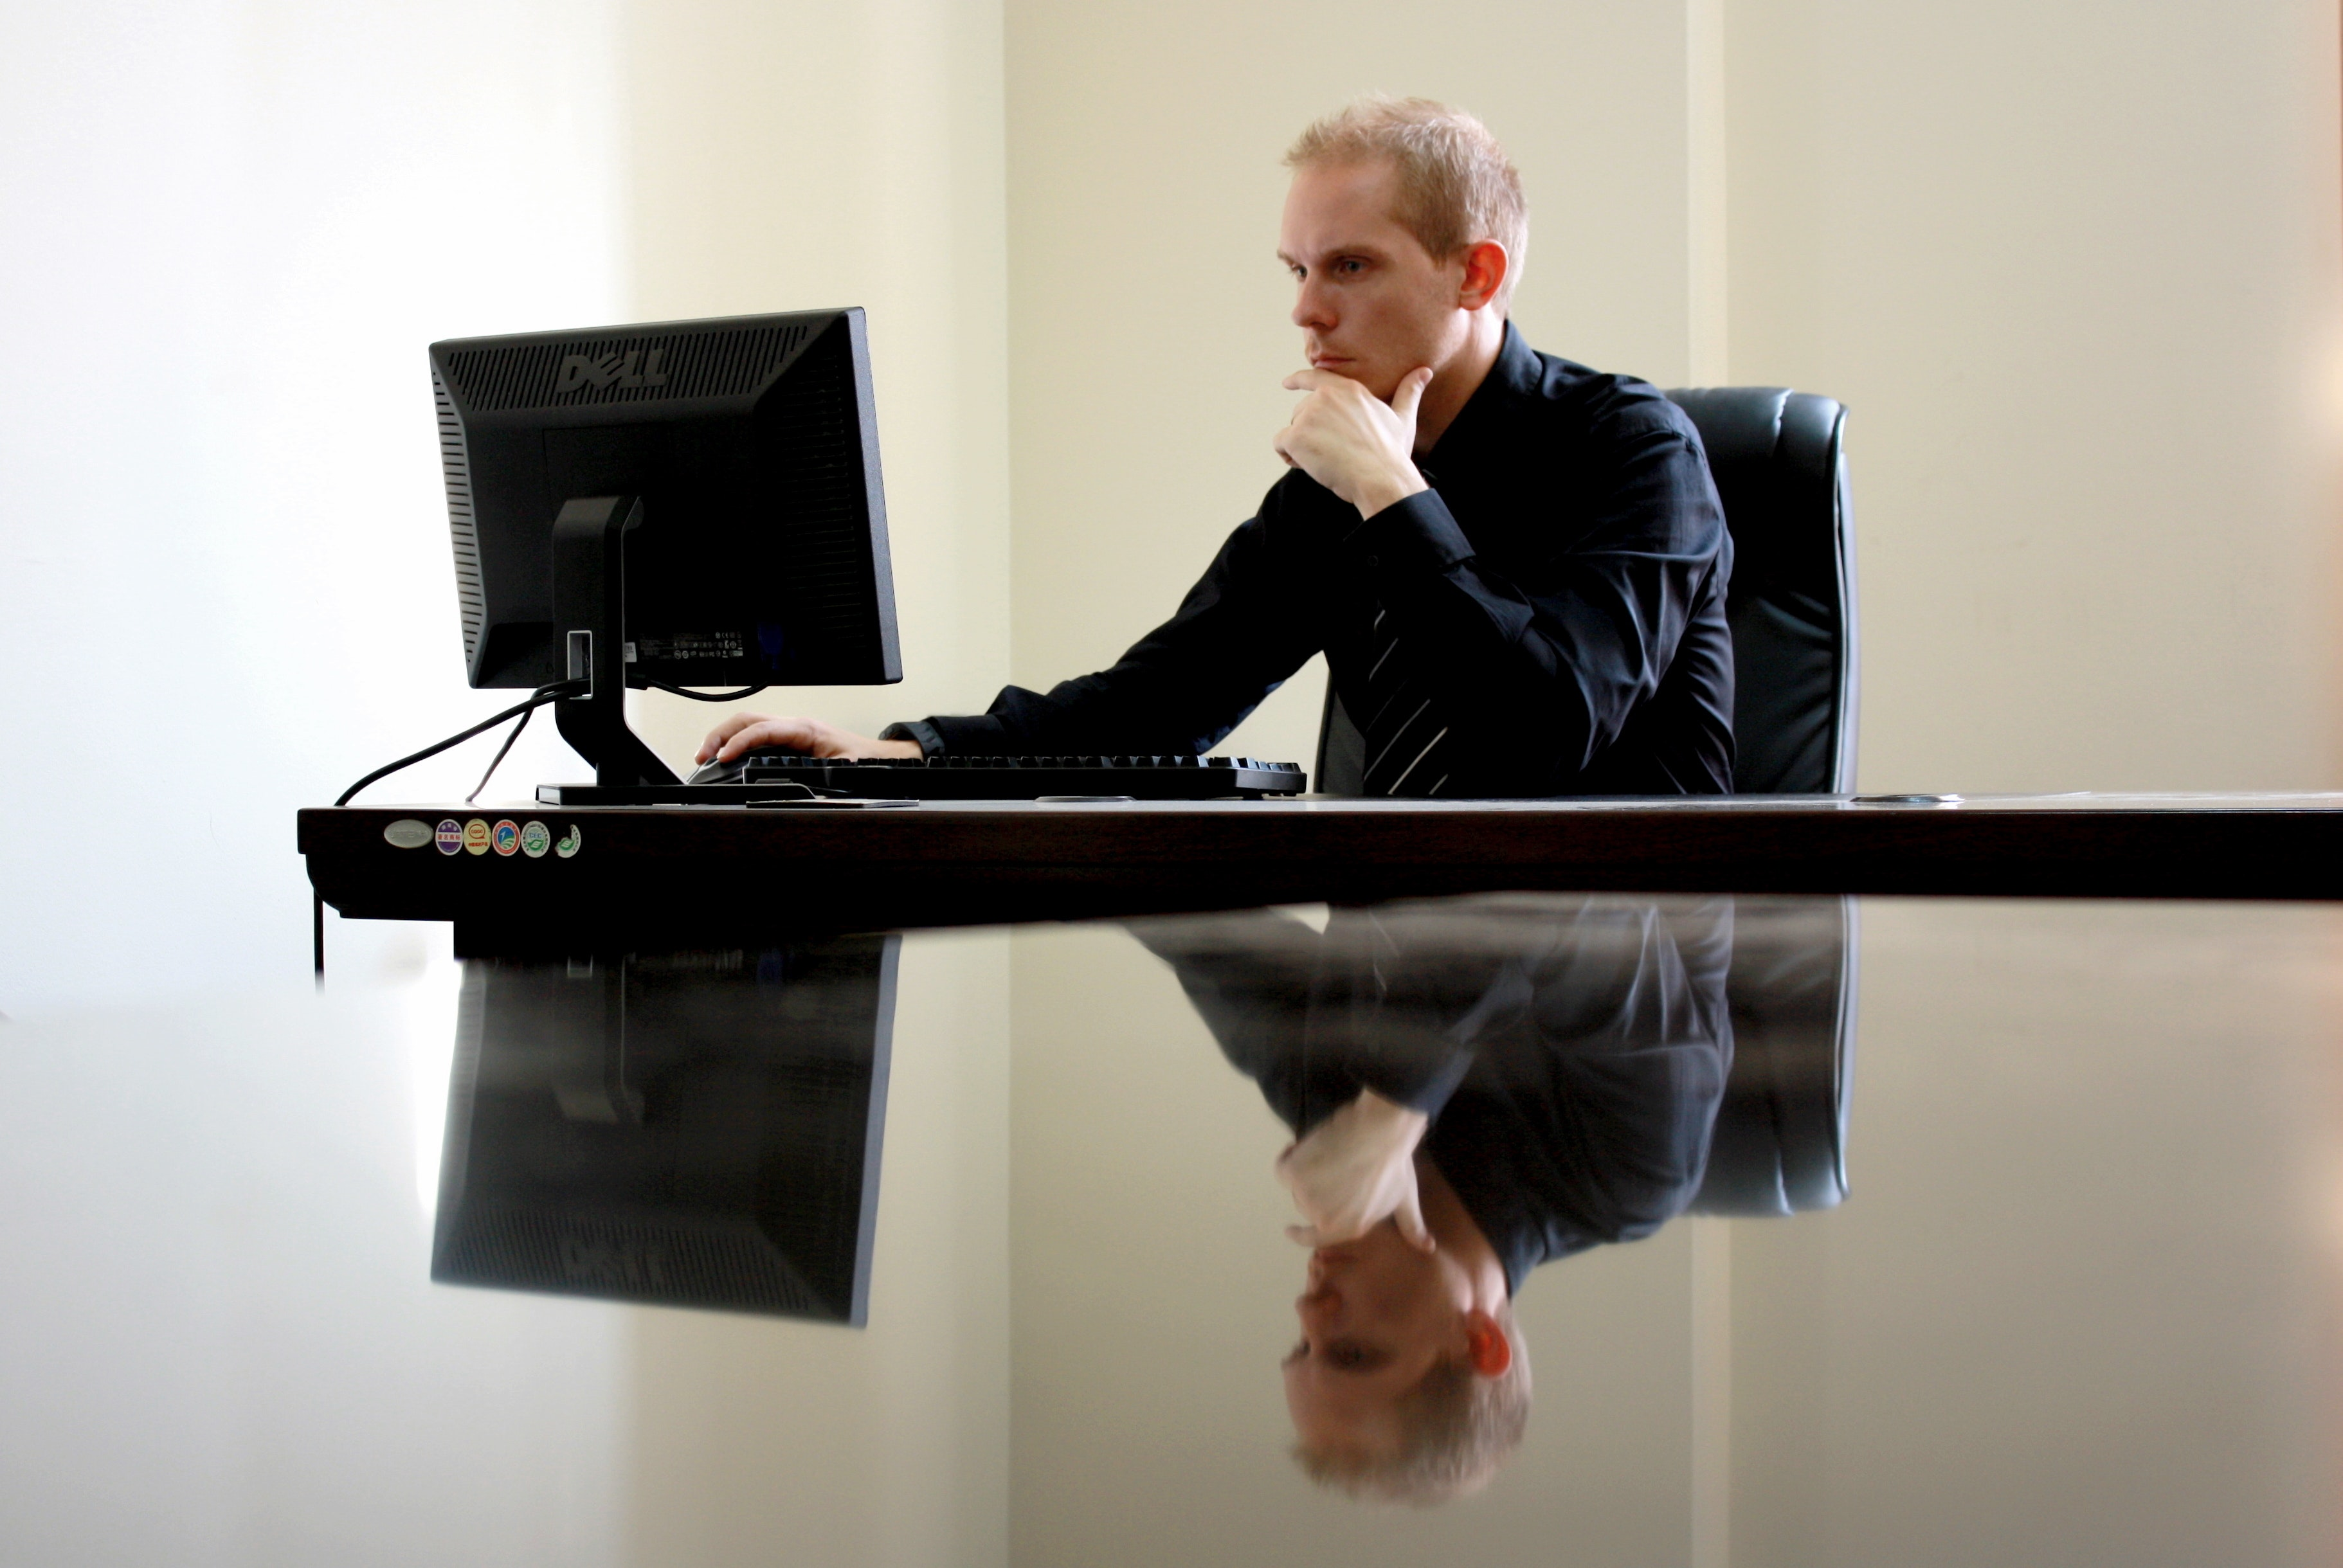 Man sitting facing pc inside room photo